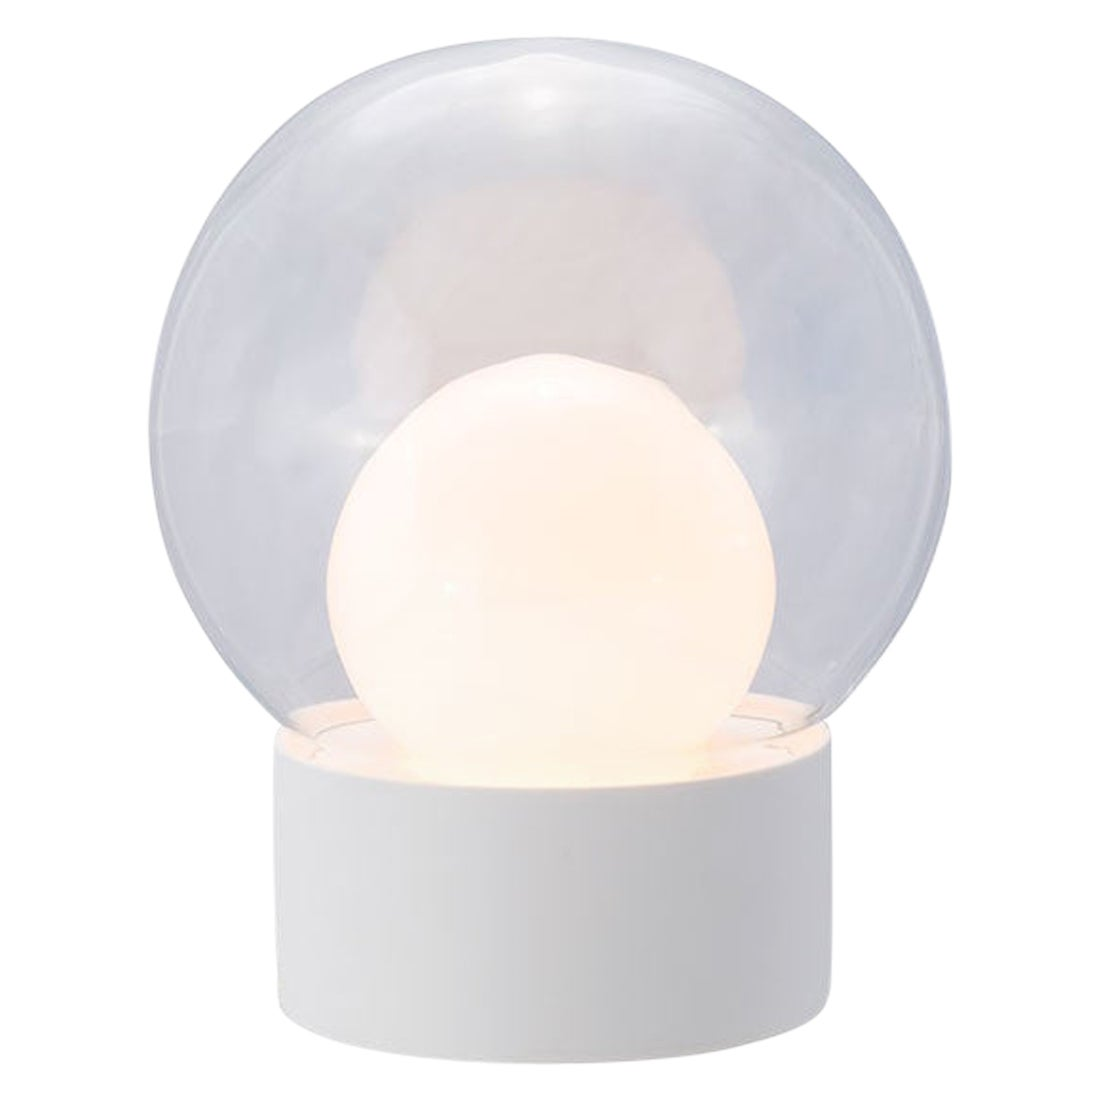 Boule, Table Light, Small, Transparent, European, Black, Minimal, 21st Century